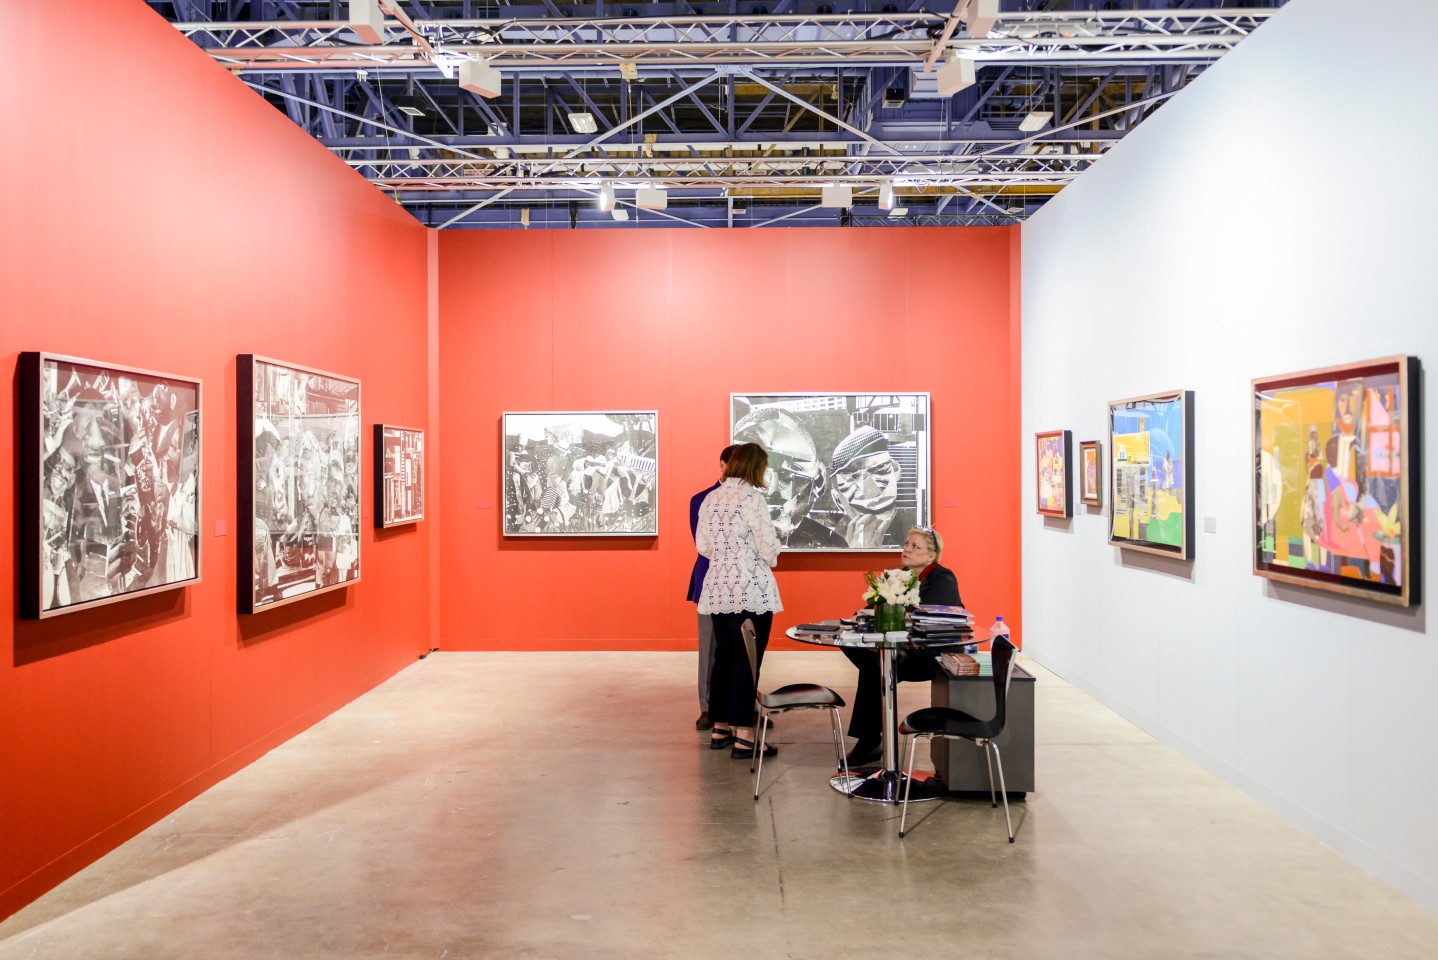 Romare Bearden at DC Moore Gallery, Art Basel in Miami Beach. © Art Basel.